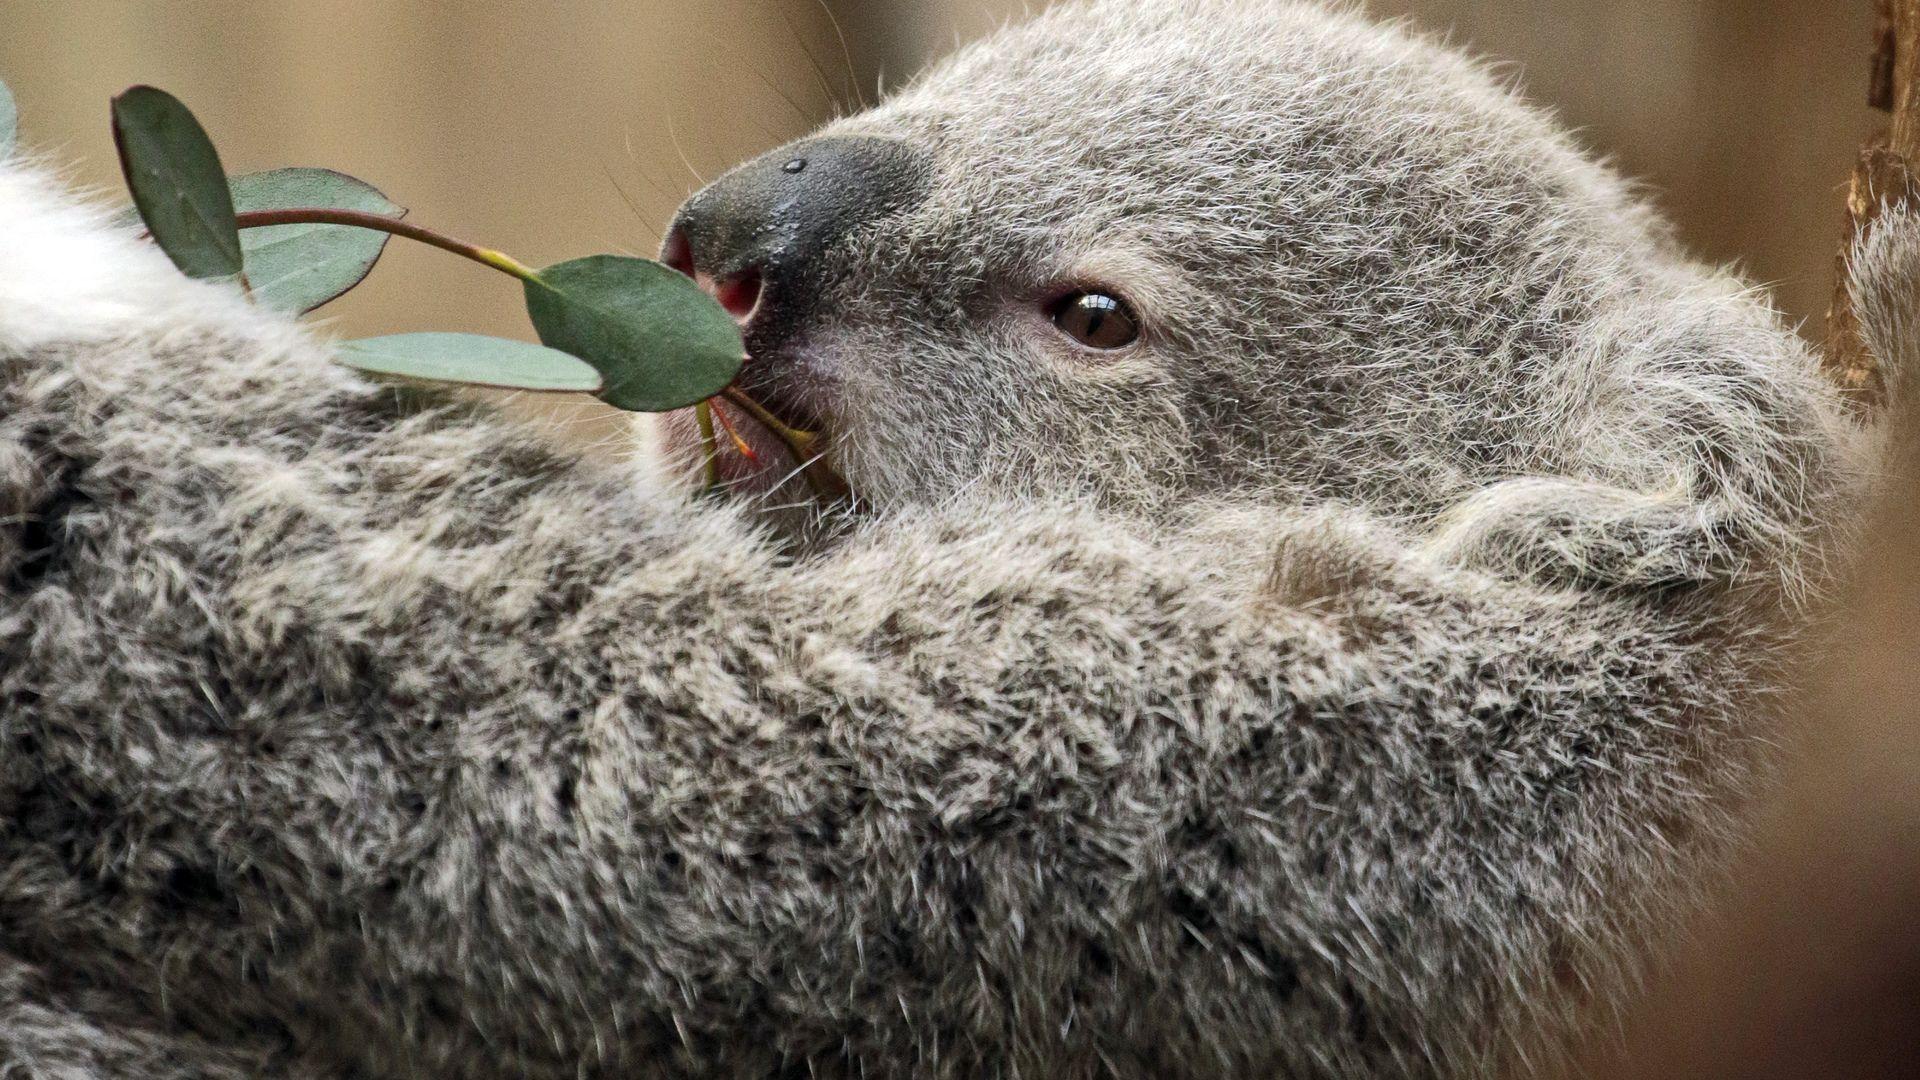 Koala Interesting Photo